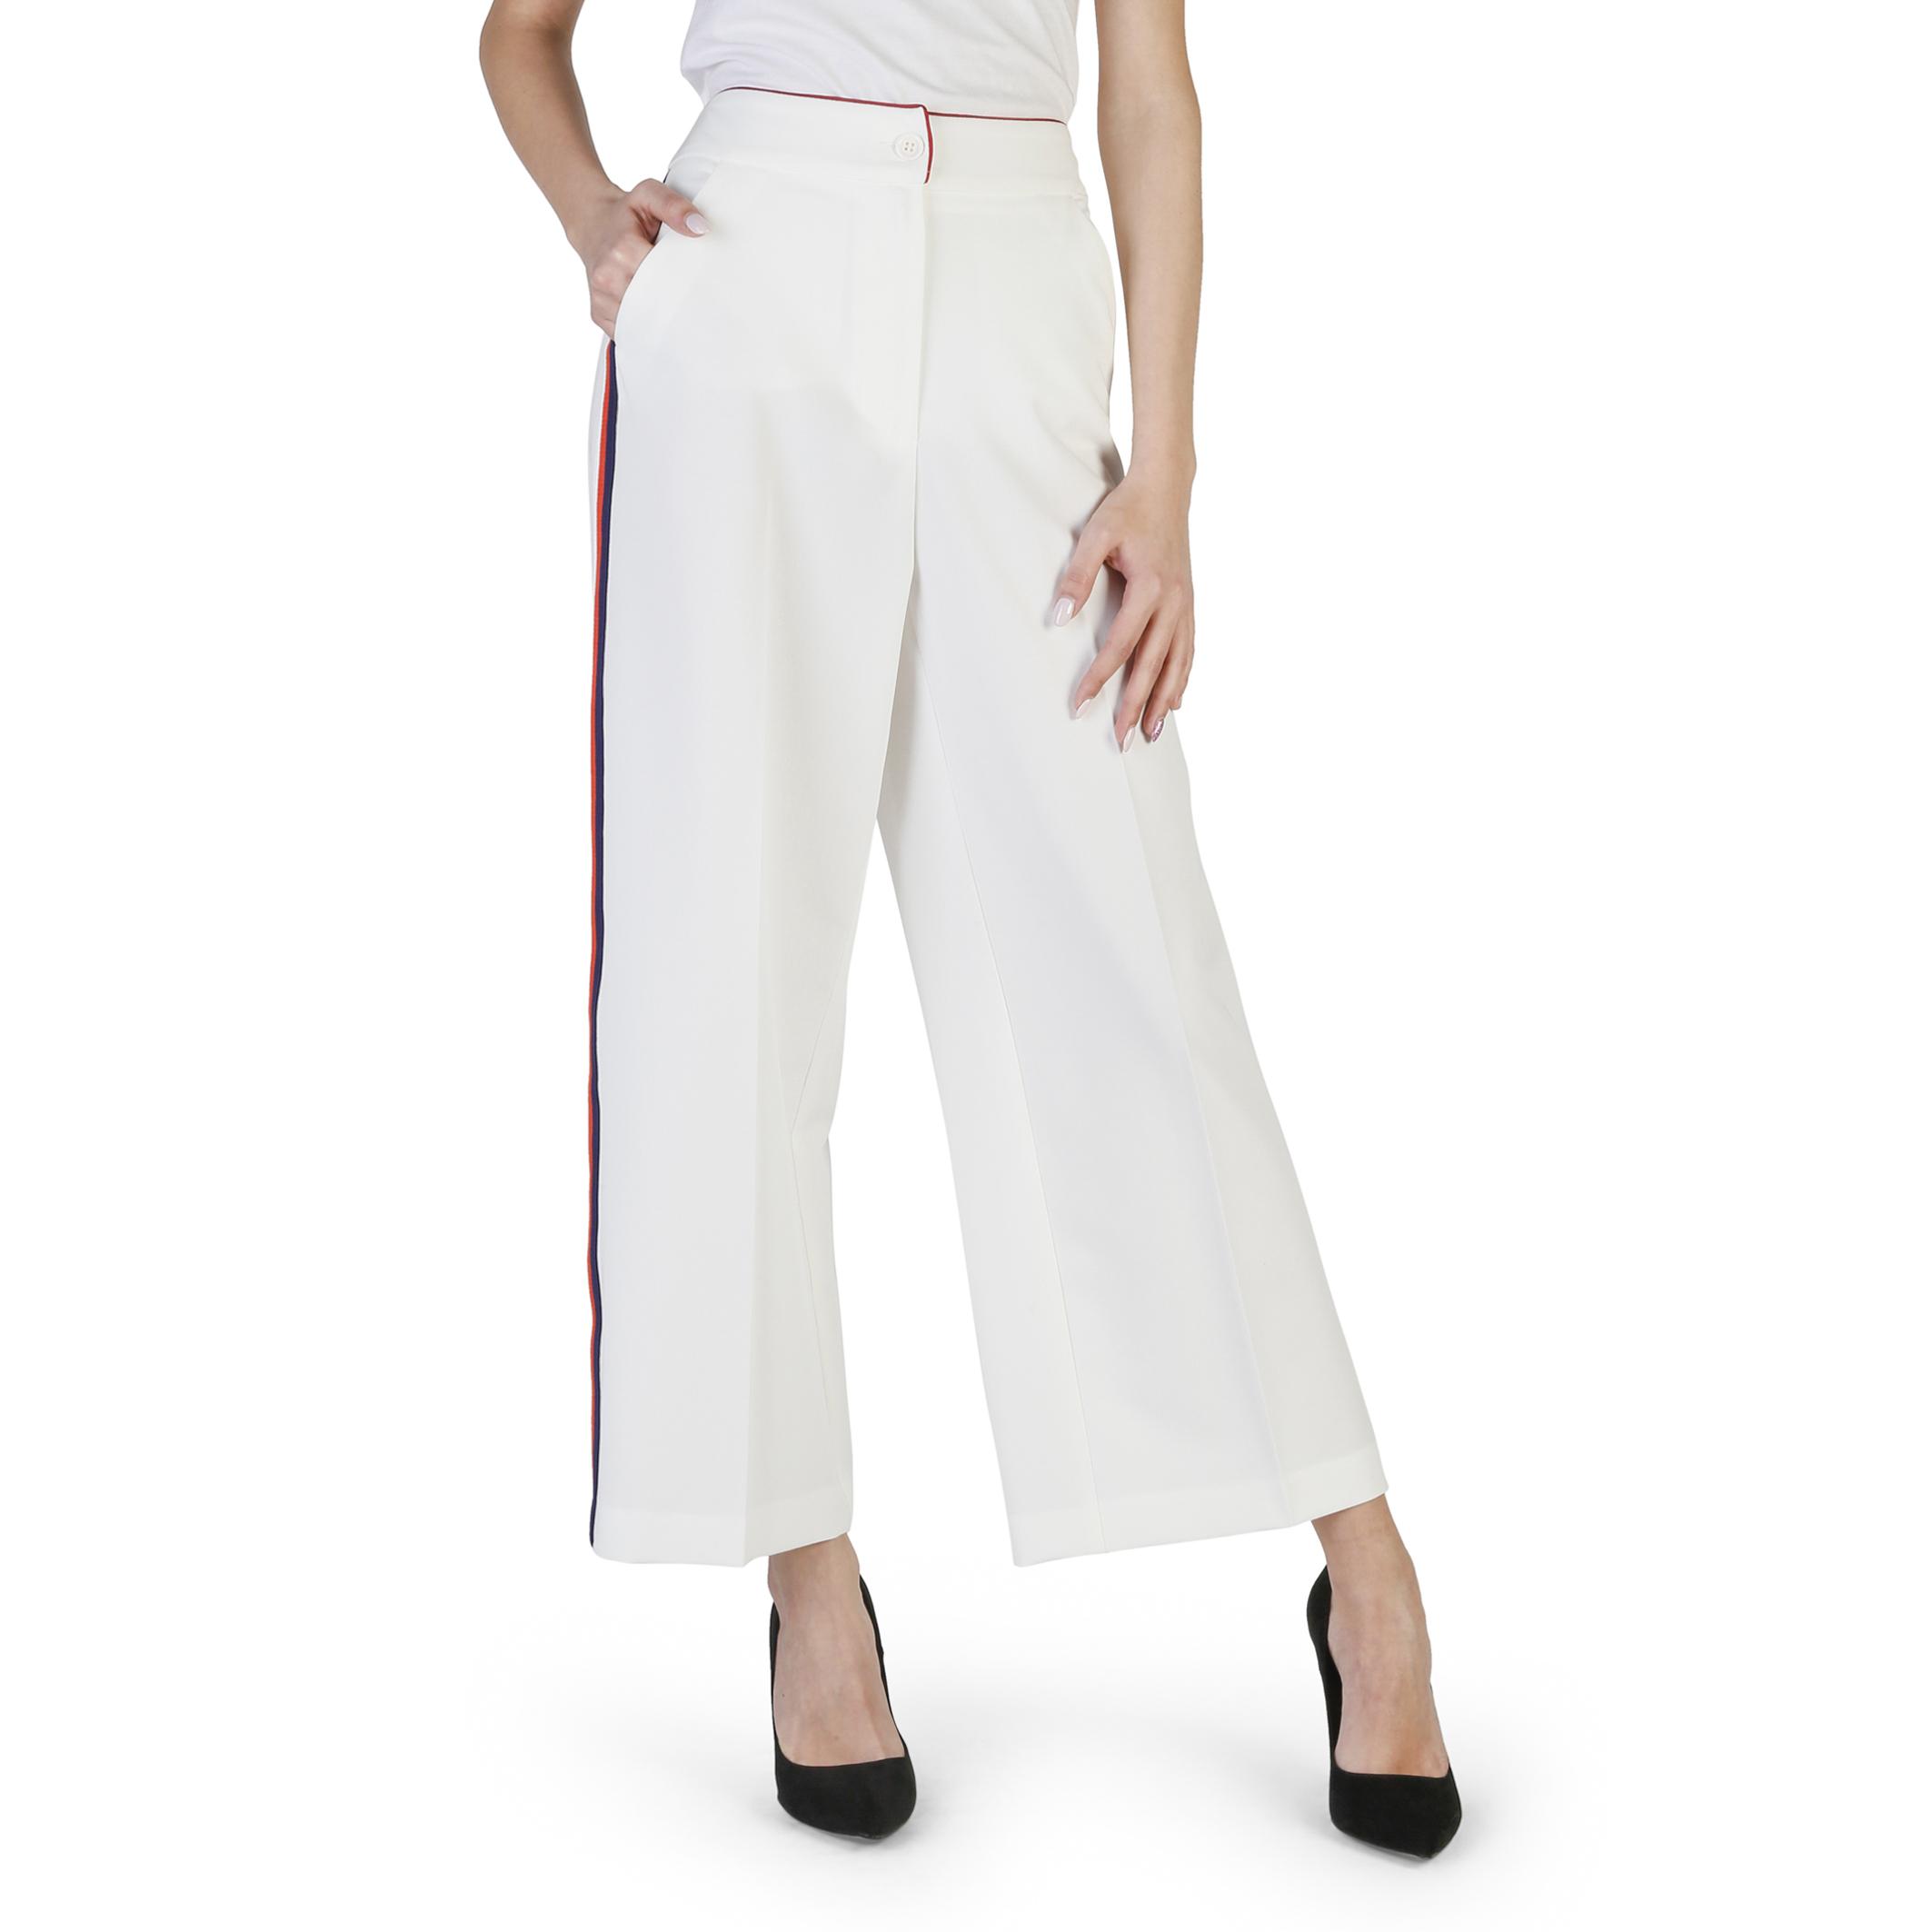 Pantalons  Imperial PUR6VFP white